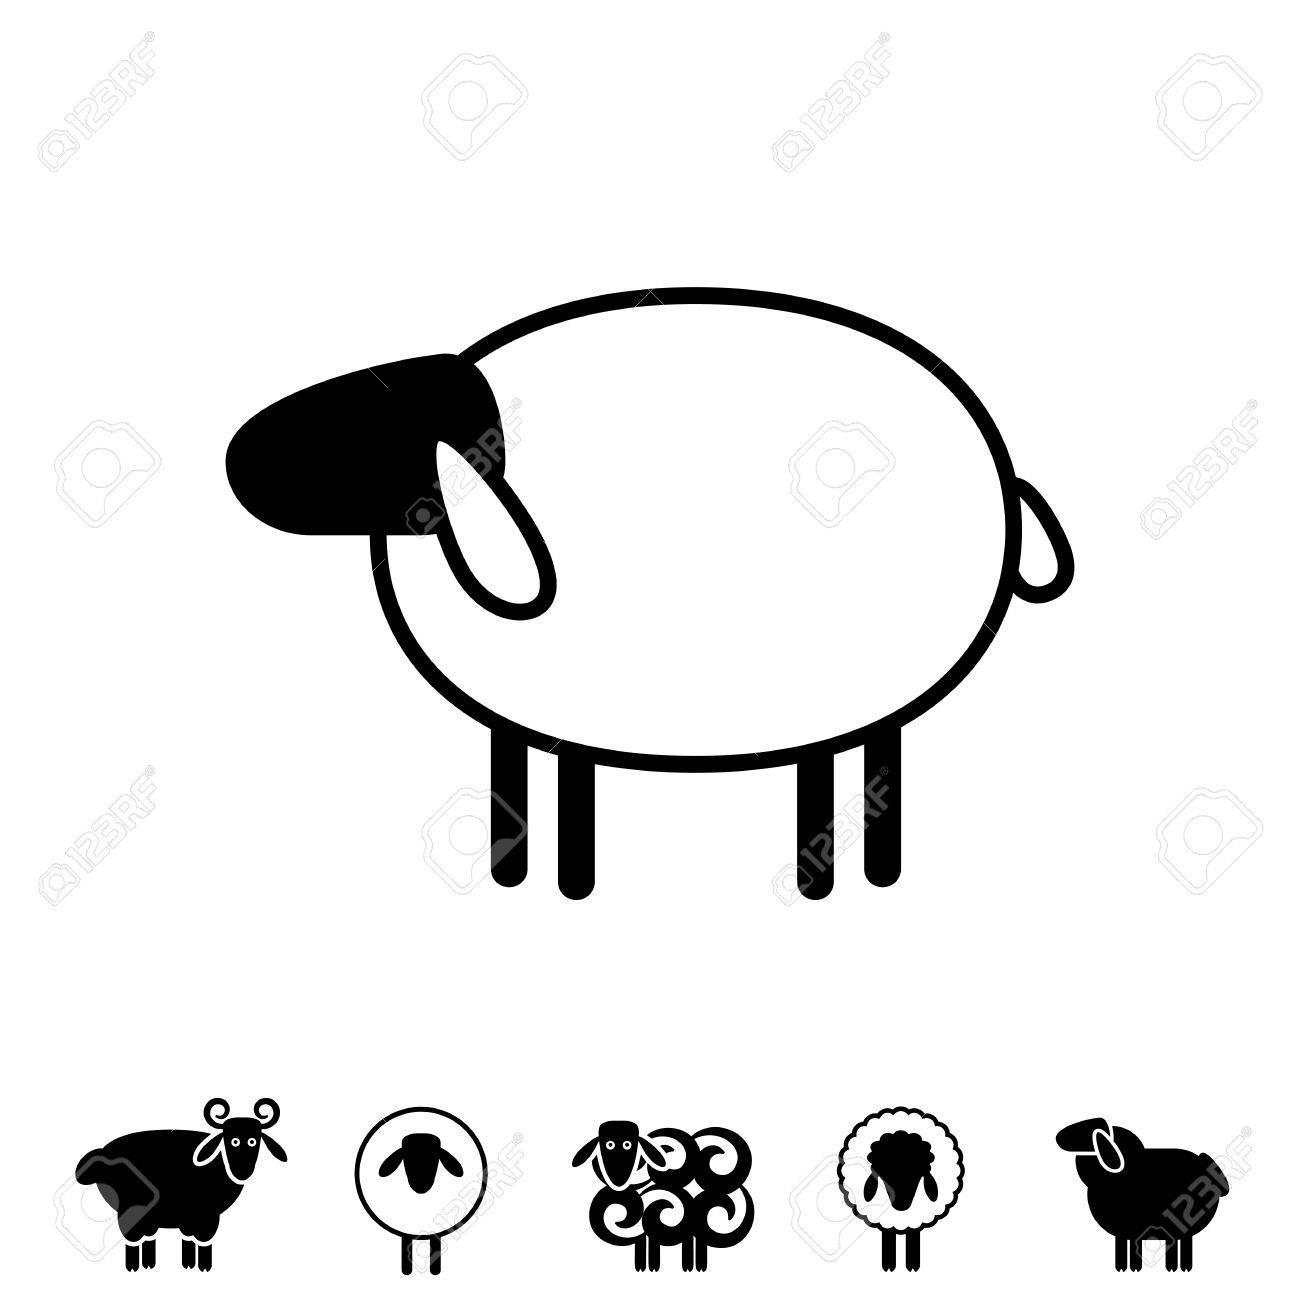 Icono De Ovejas O Ram, Logotipo, Plantilla, Pictograma. Símbolo De ...